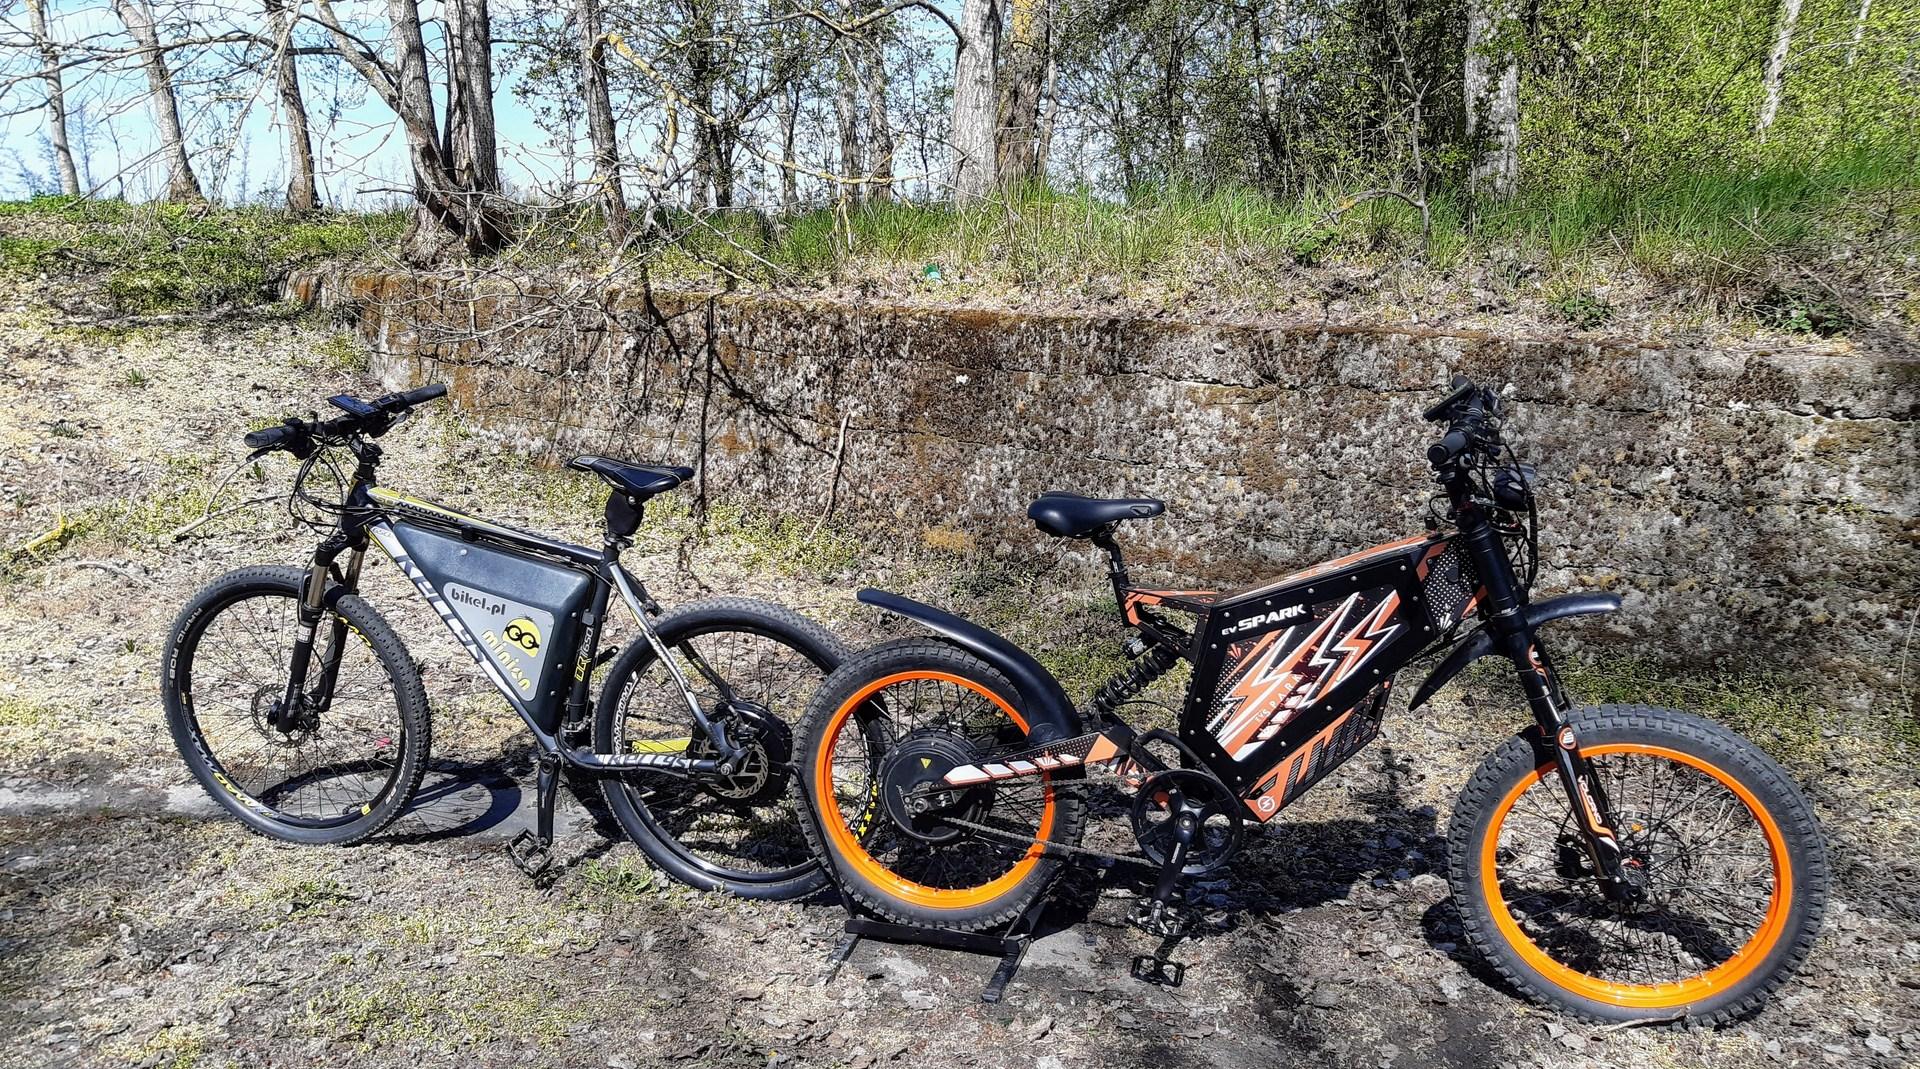 Ev Spark e-bike and Minion